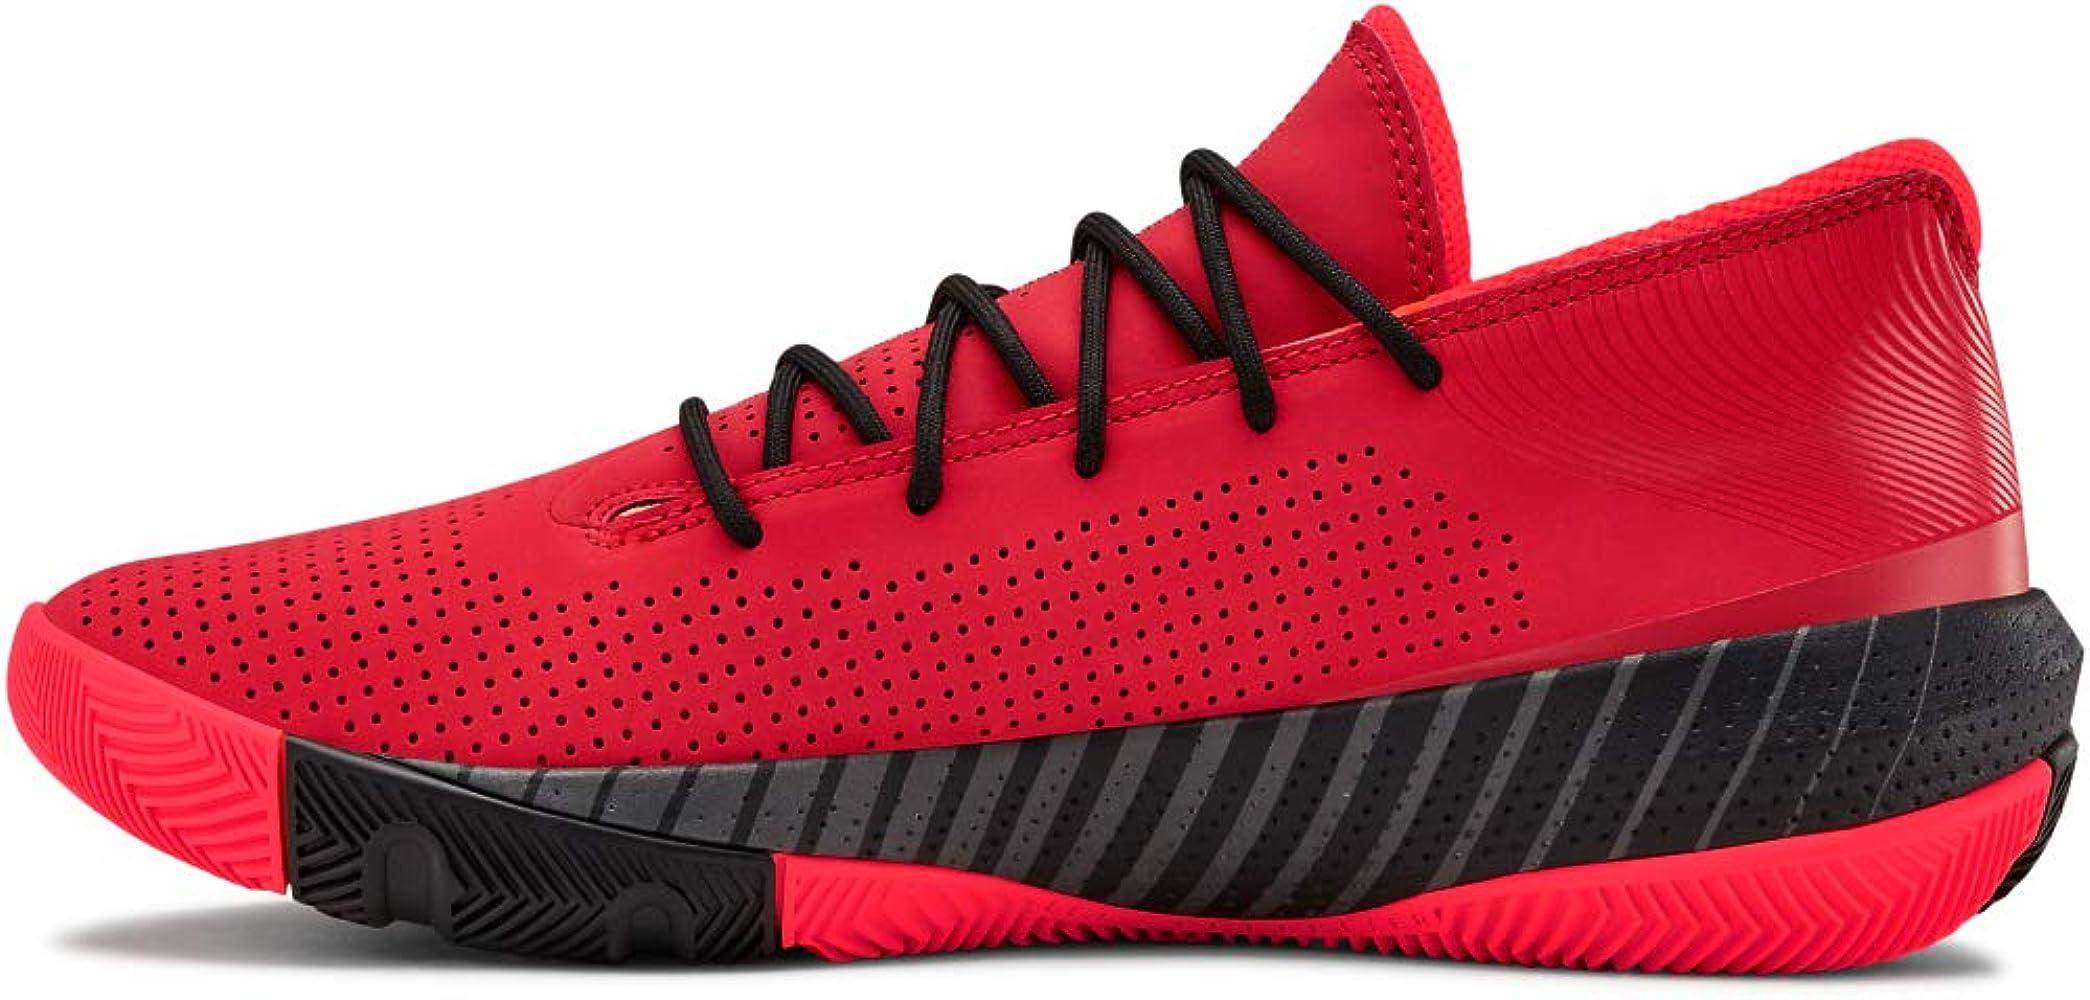 Under Armour Sc 3zer0 Iii Zapatos de Baloncesto Hombre, Rojo (Red ...